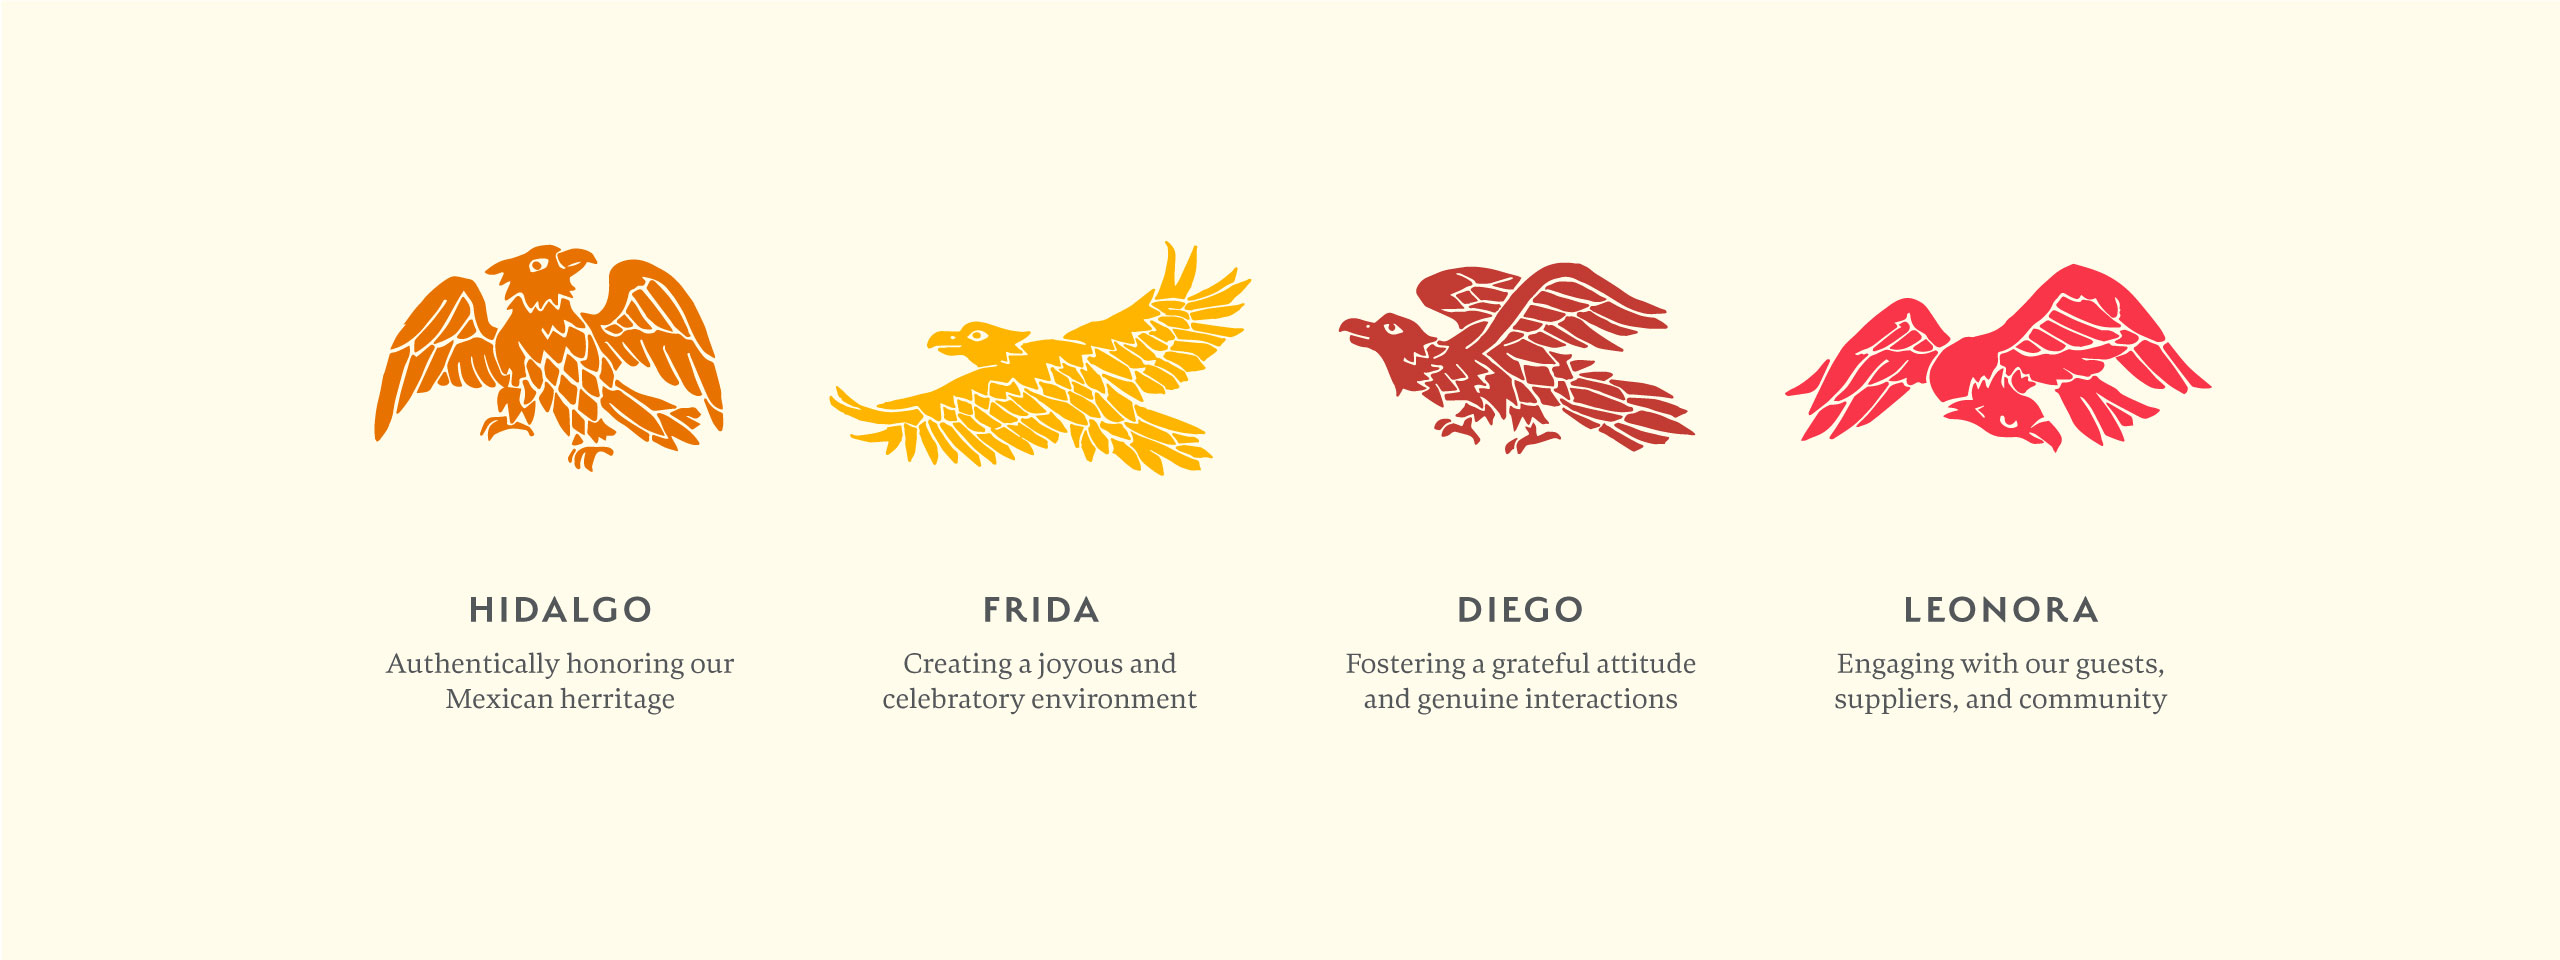 Tortilla Republic eagle illustrations orange and pink with descriptions